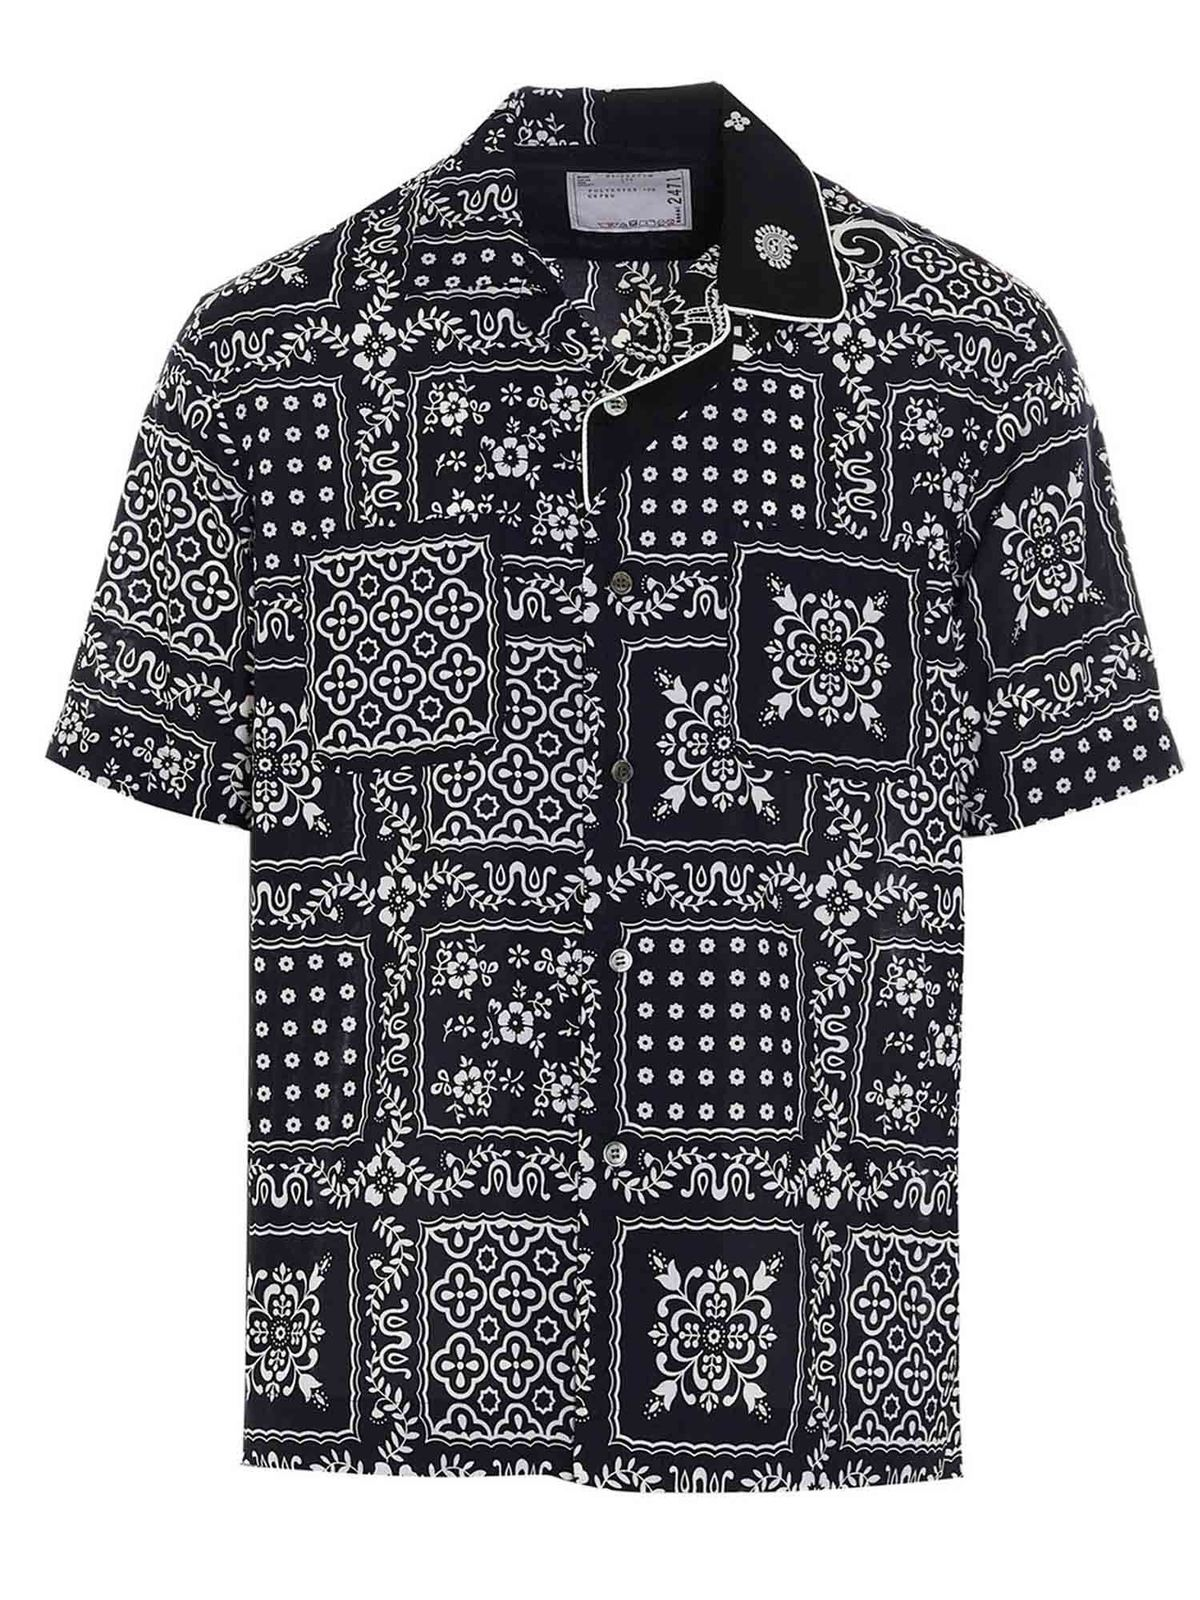 Sacai Shirts PAISLEY PATTERNED SHIRT IN BLUE